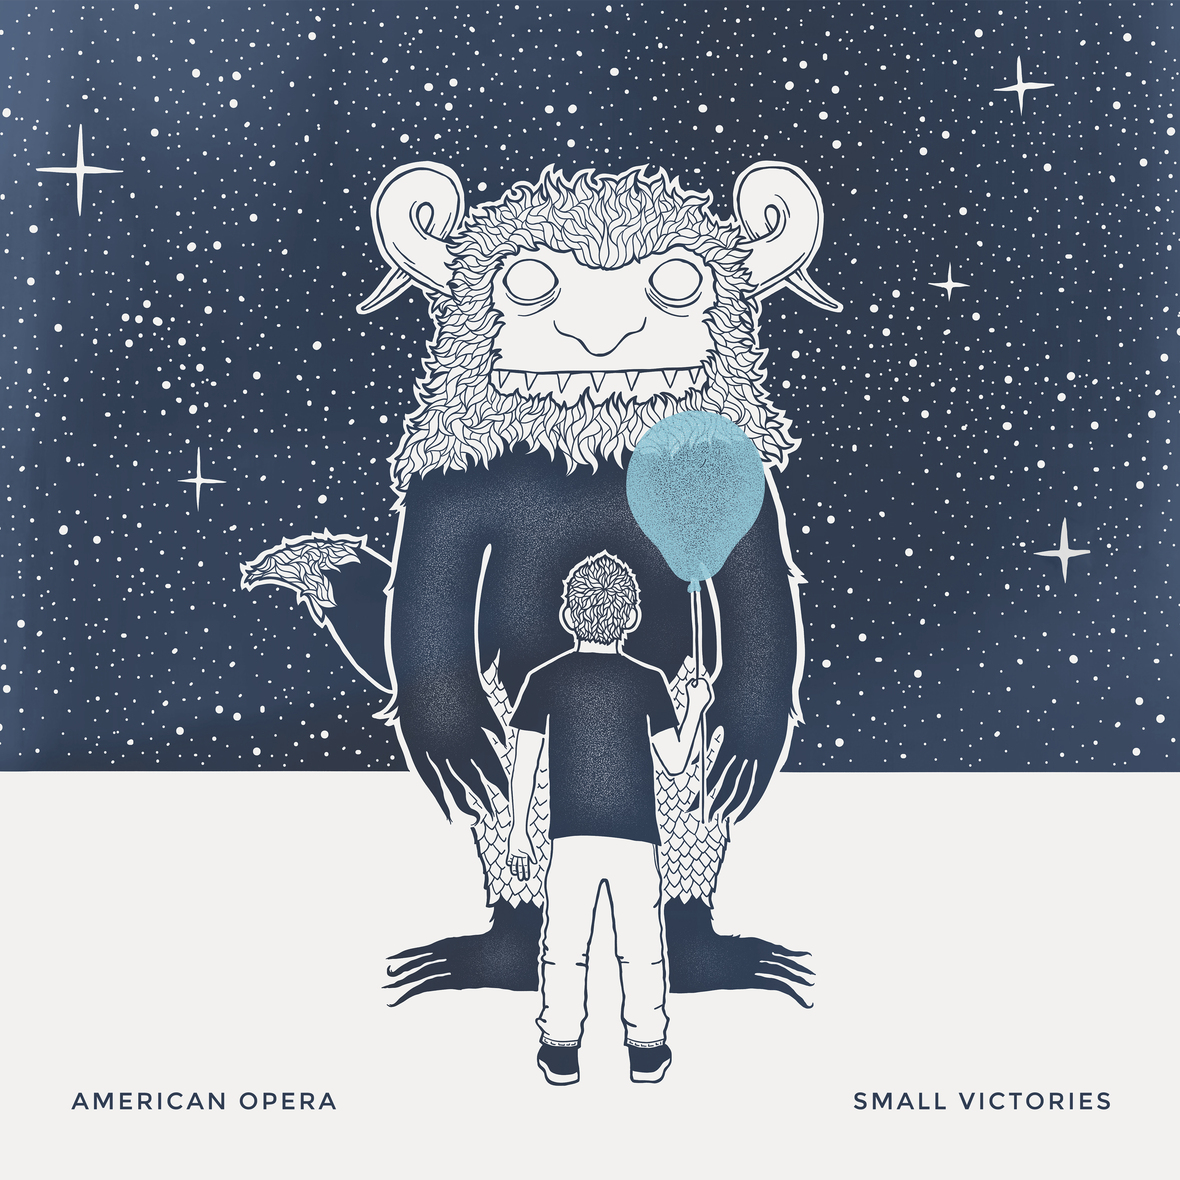 american opera small victories